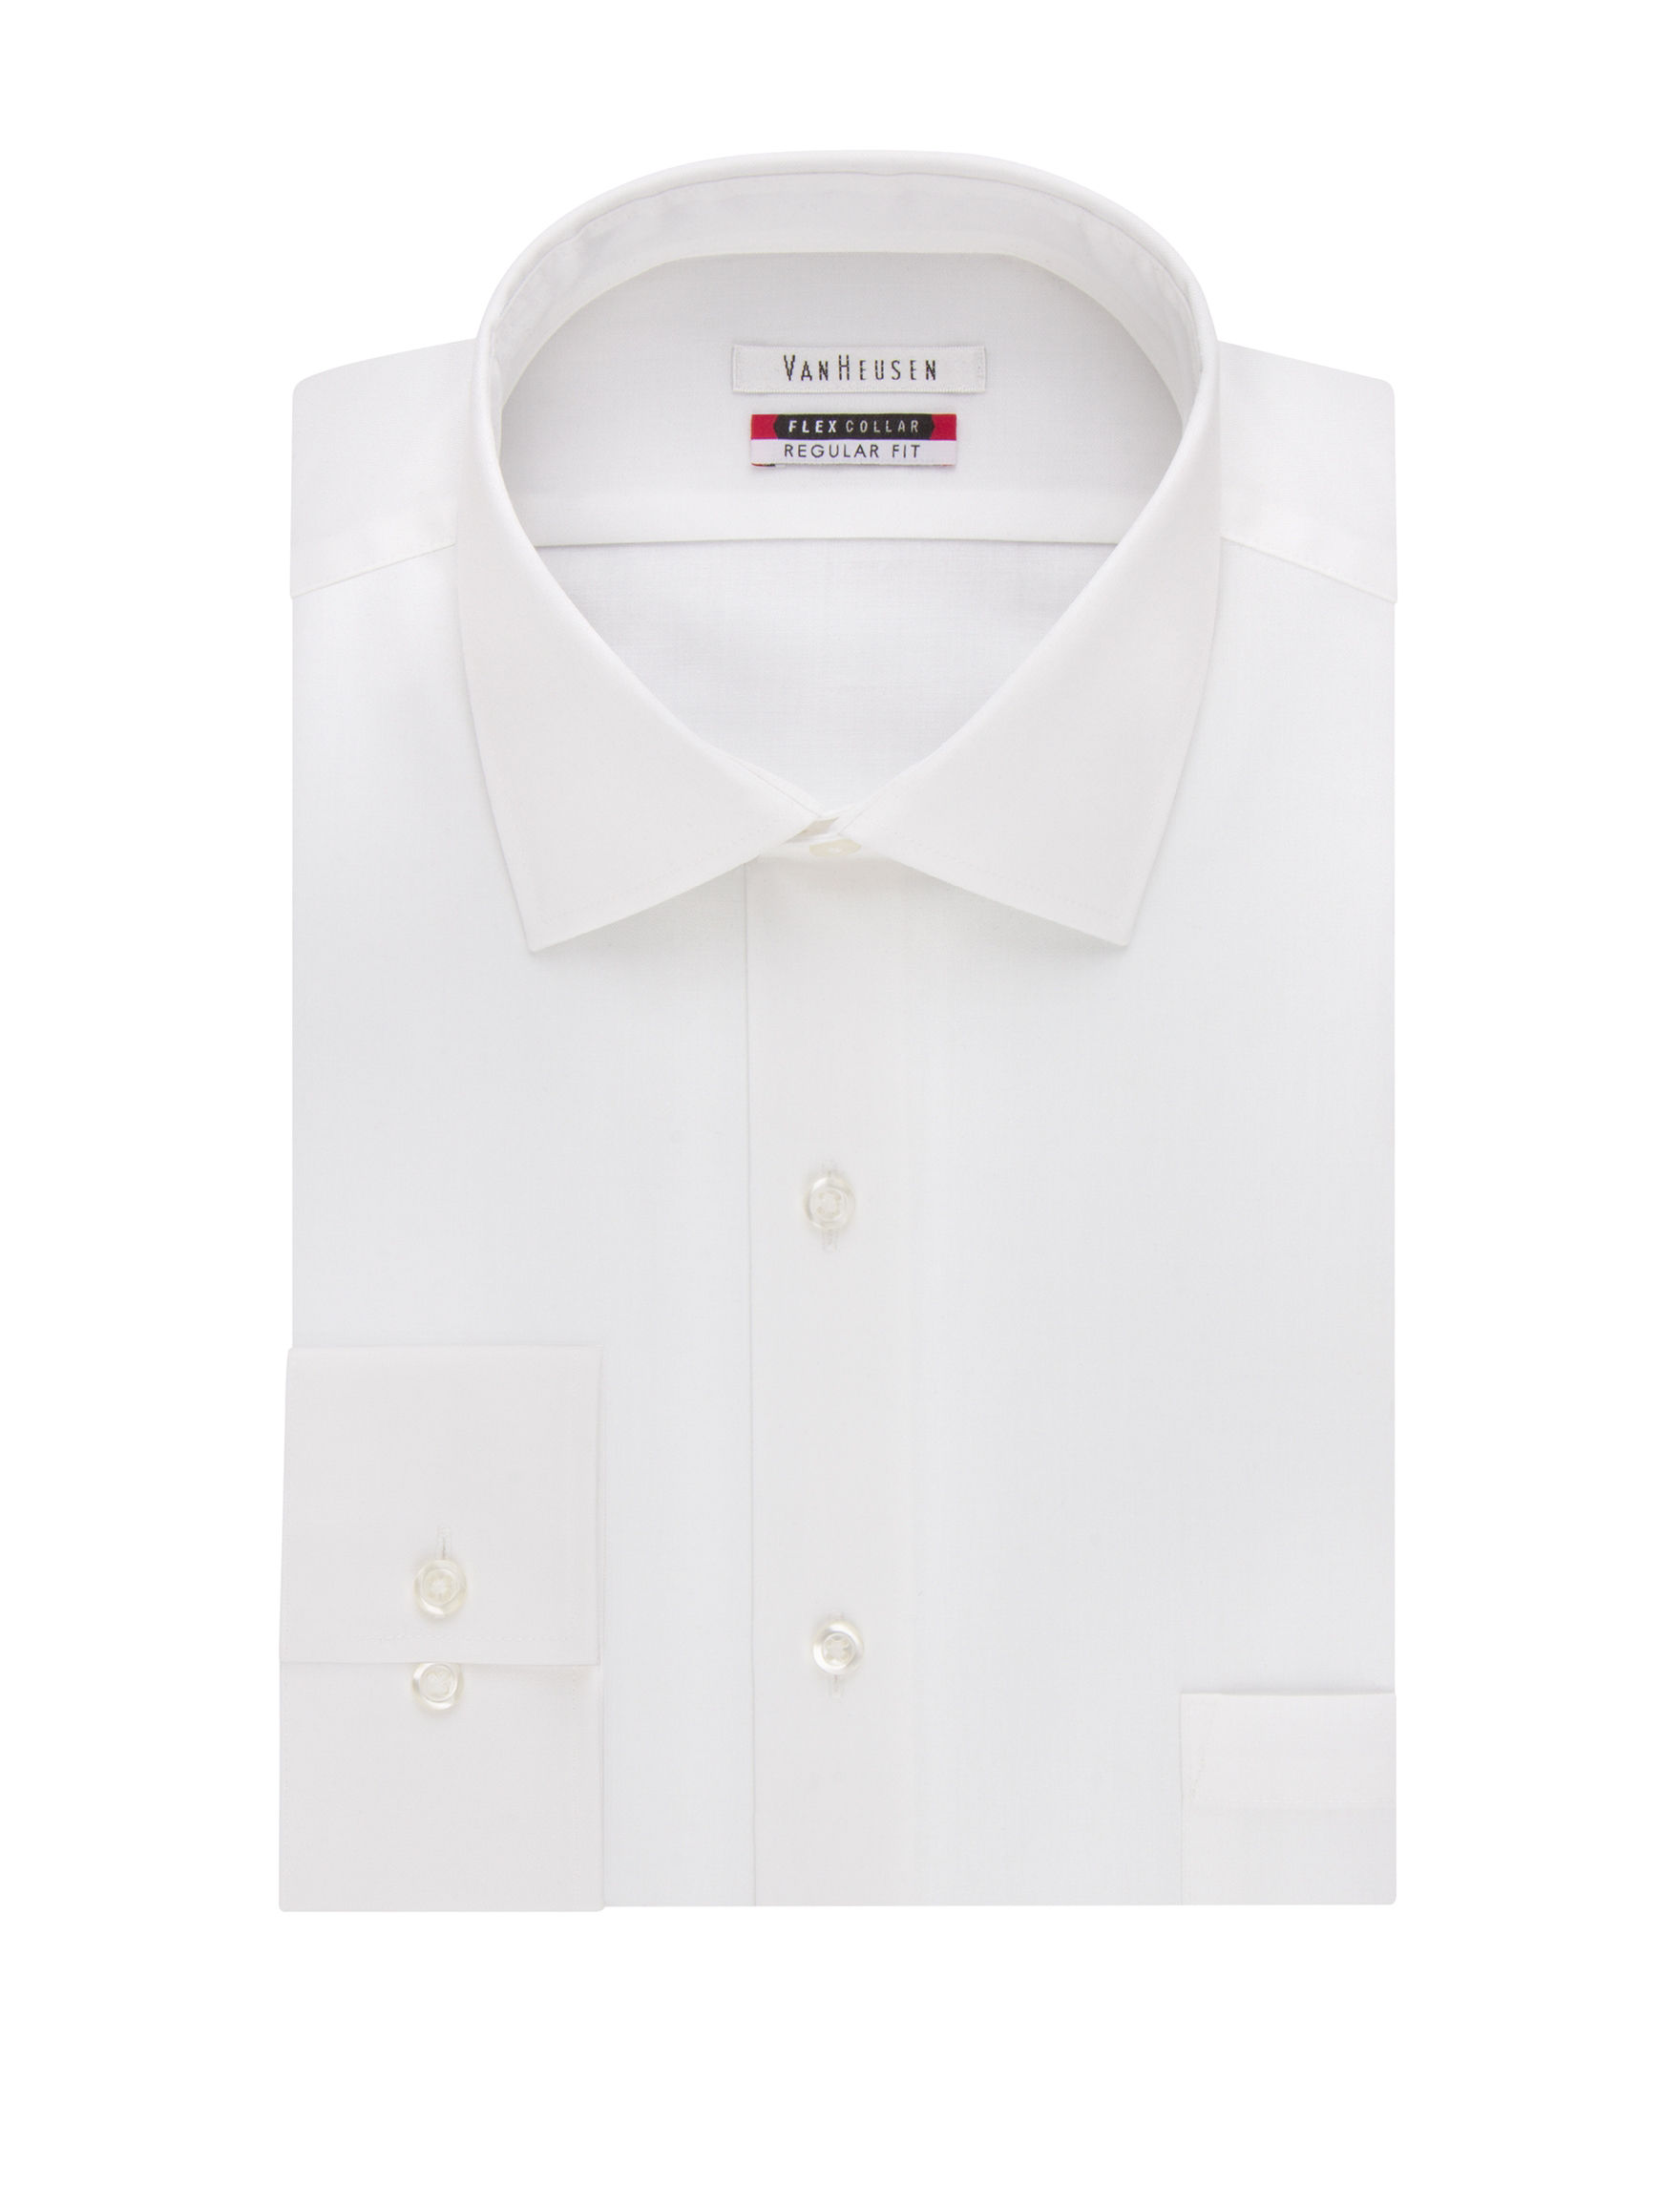 Van Heusen White Dress Shirts